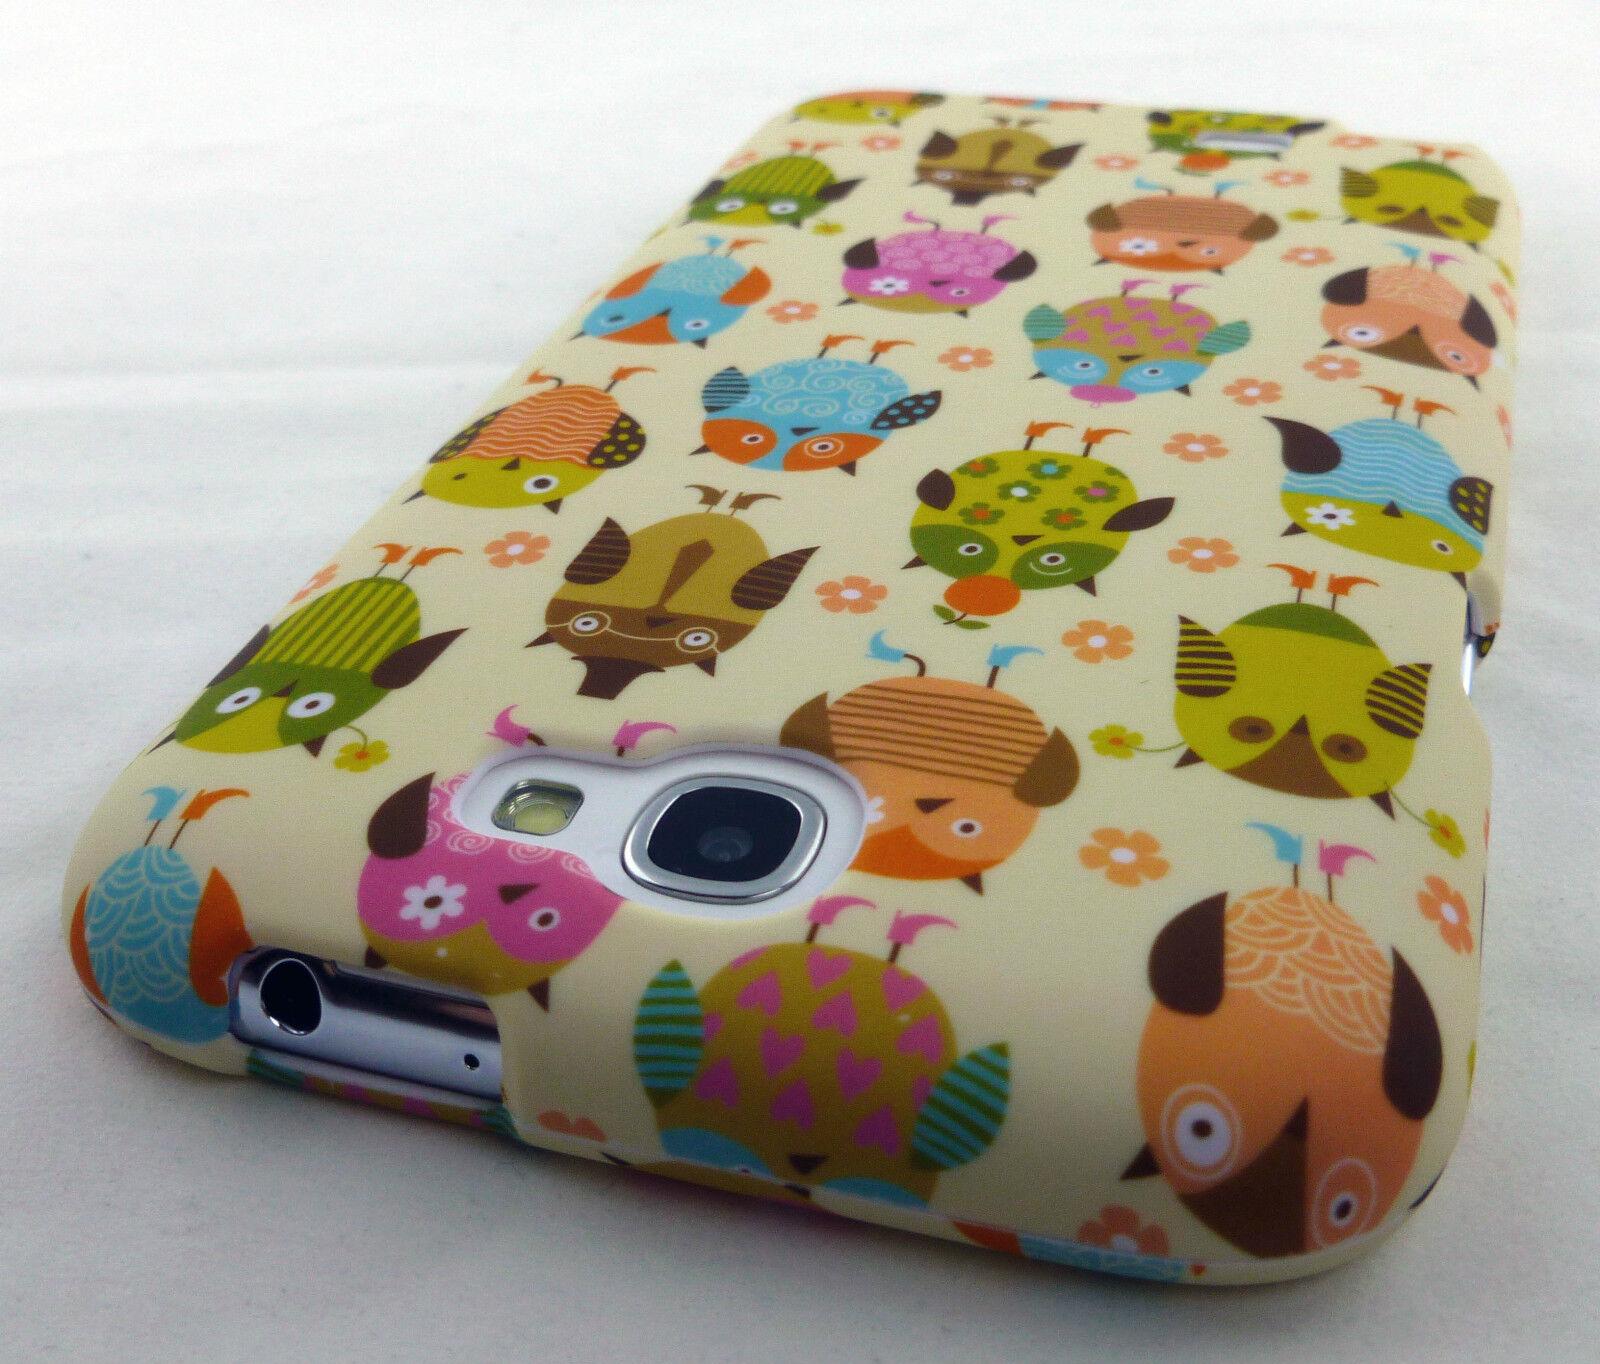 CUTE ODDBALL OWL PATTERN HARD SNAP-ON CASE COVER SAMSUNG GALAXY NOTE II 2 PHONE